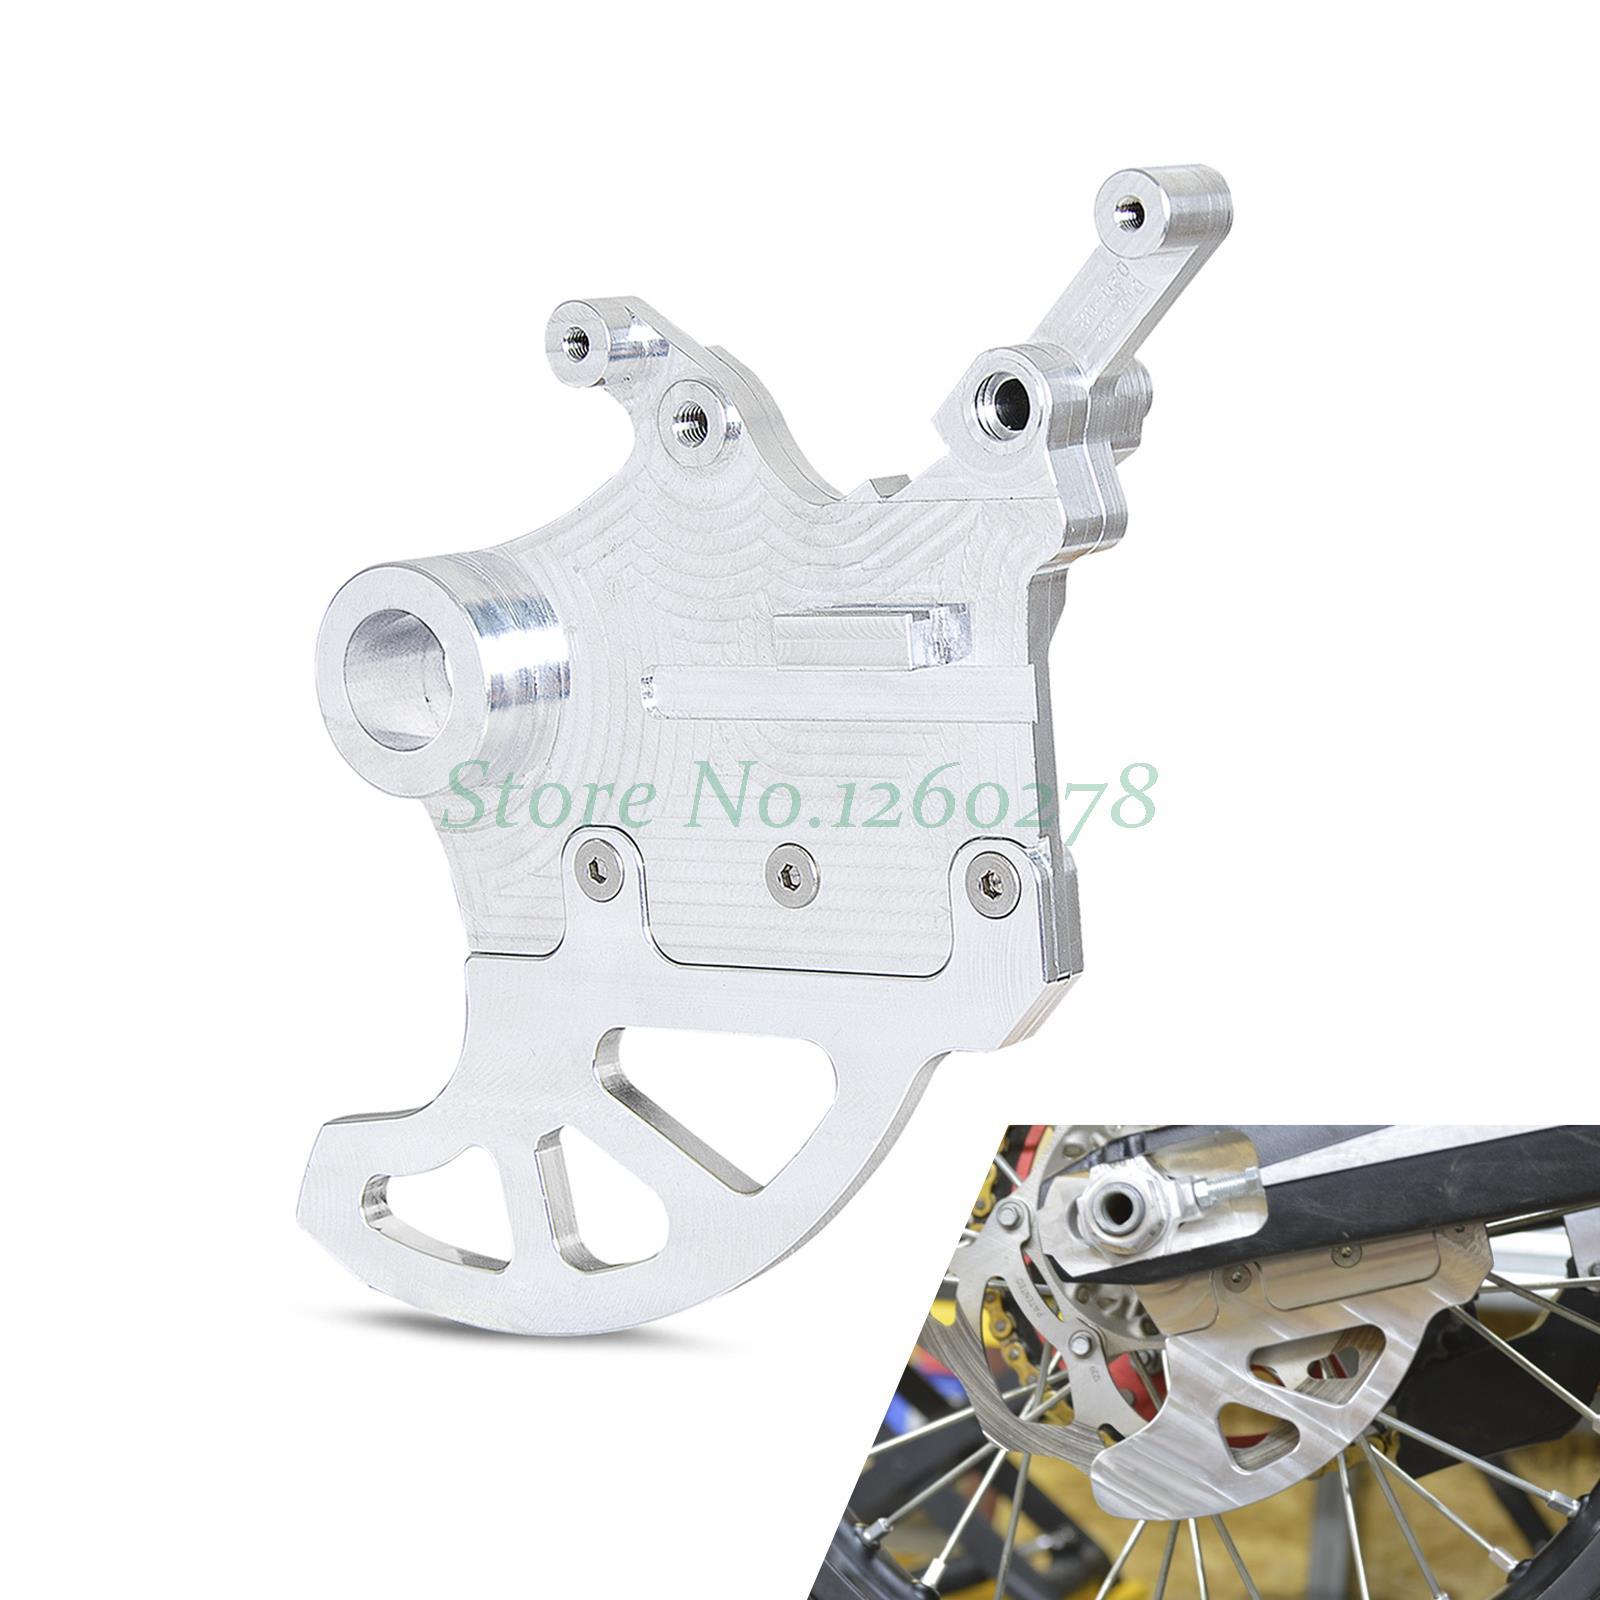 Brake Disc Guard/Protector for Yamaha YZ250F 450F 2009-2016 keoghs real adelin 260mm floating brake disc high quality for yamaha scooter cygnus modify